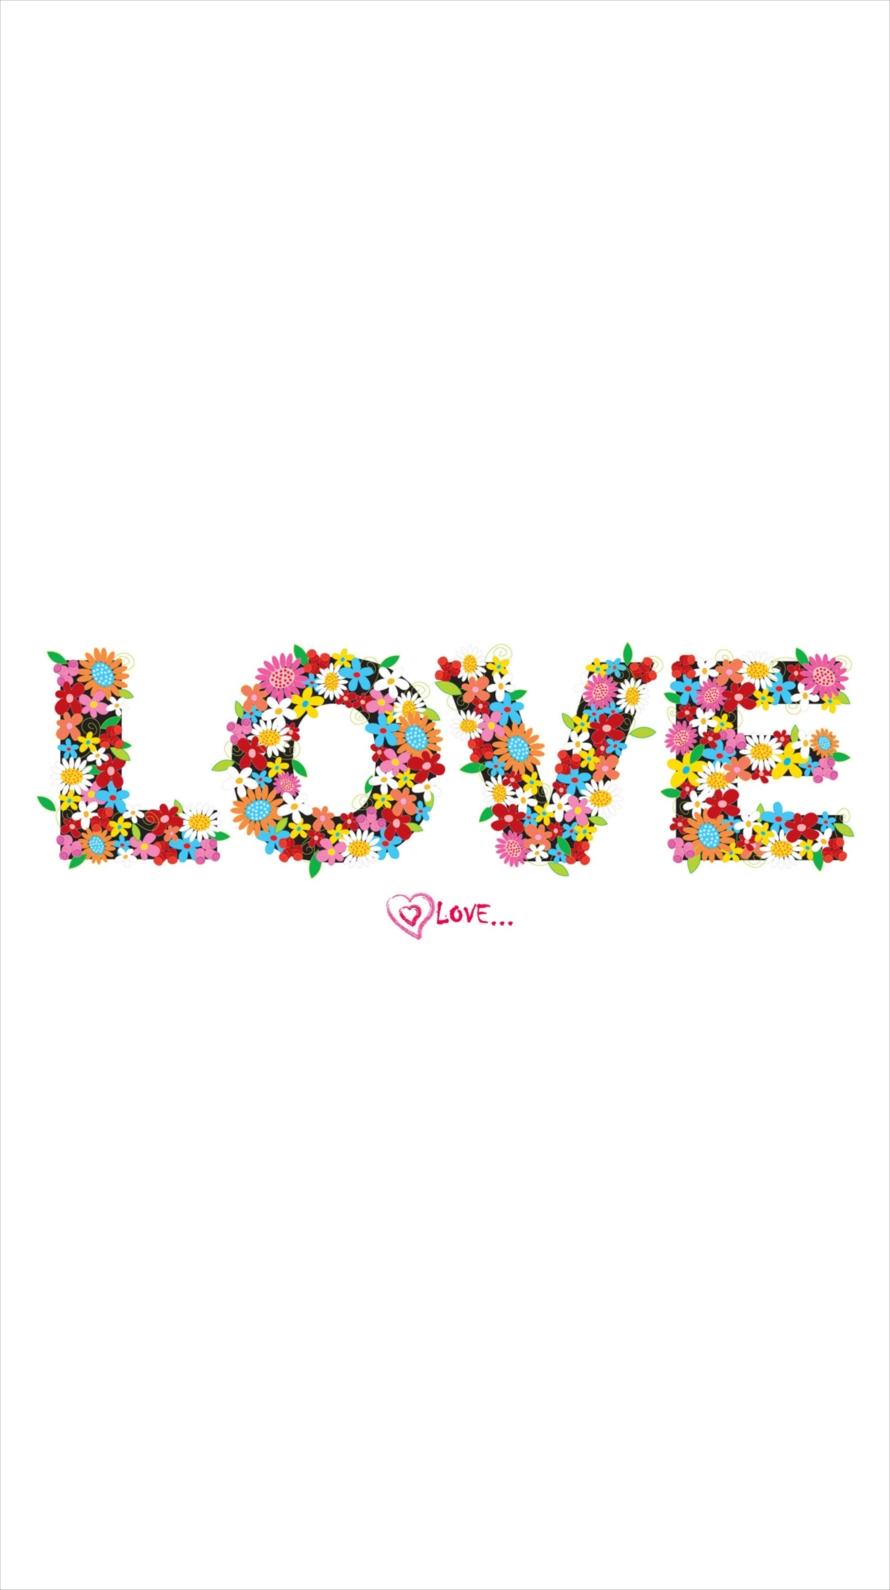 LOVEロゴ iPhone6壁紙